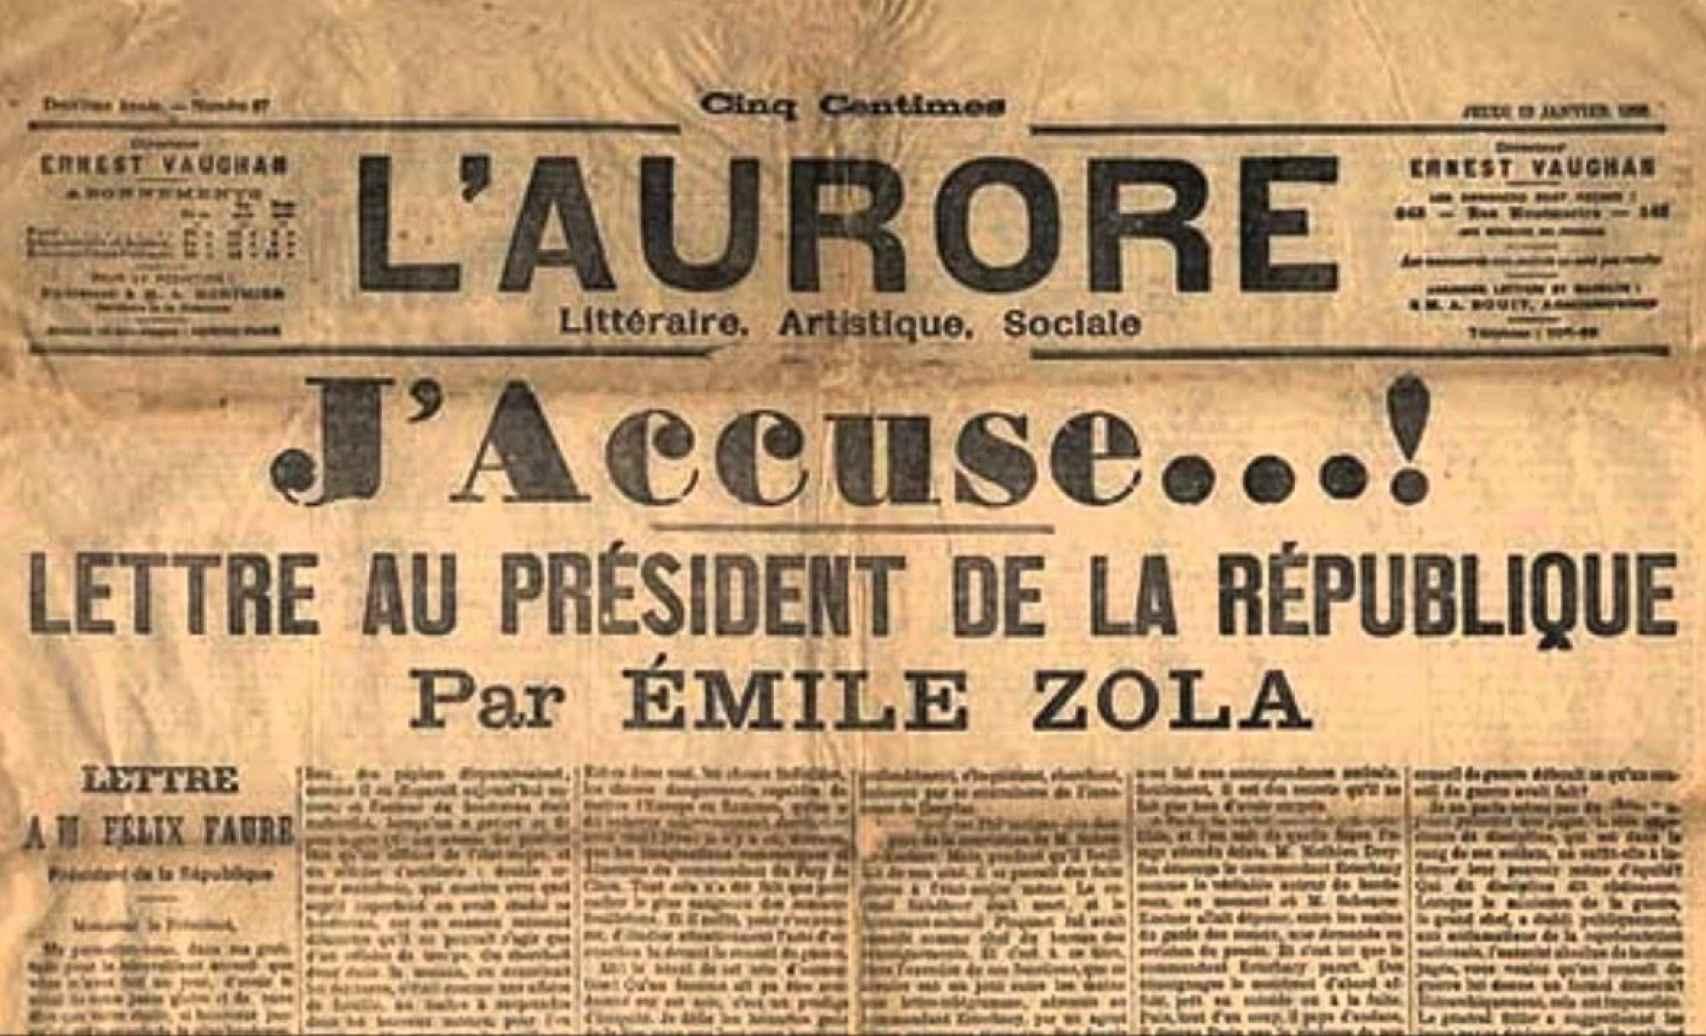 'J'accuse...!' de Émile Zola.